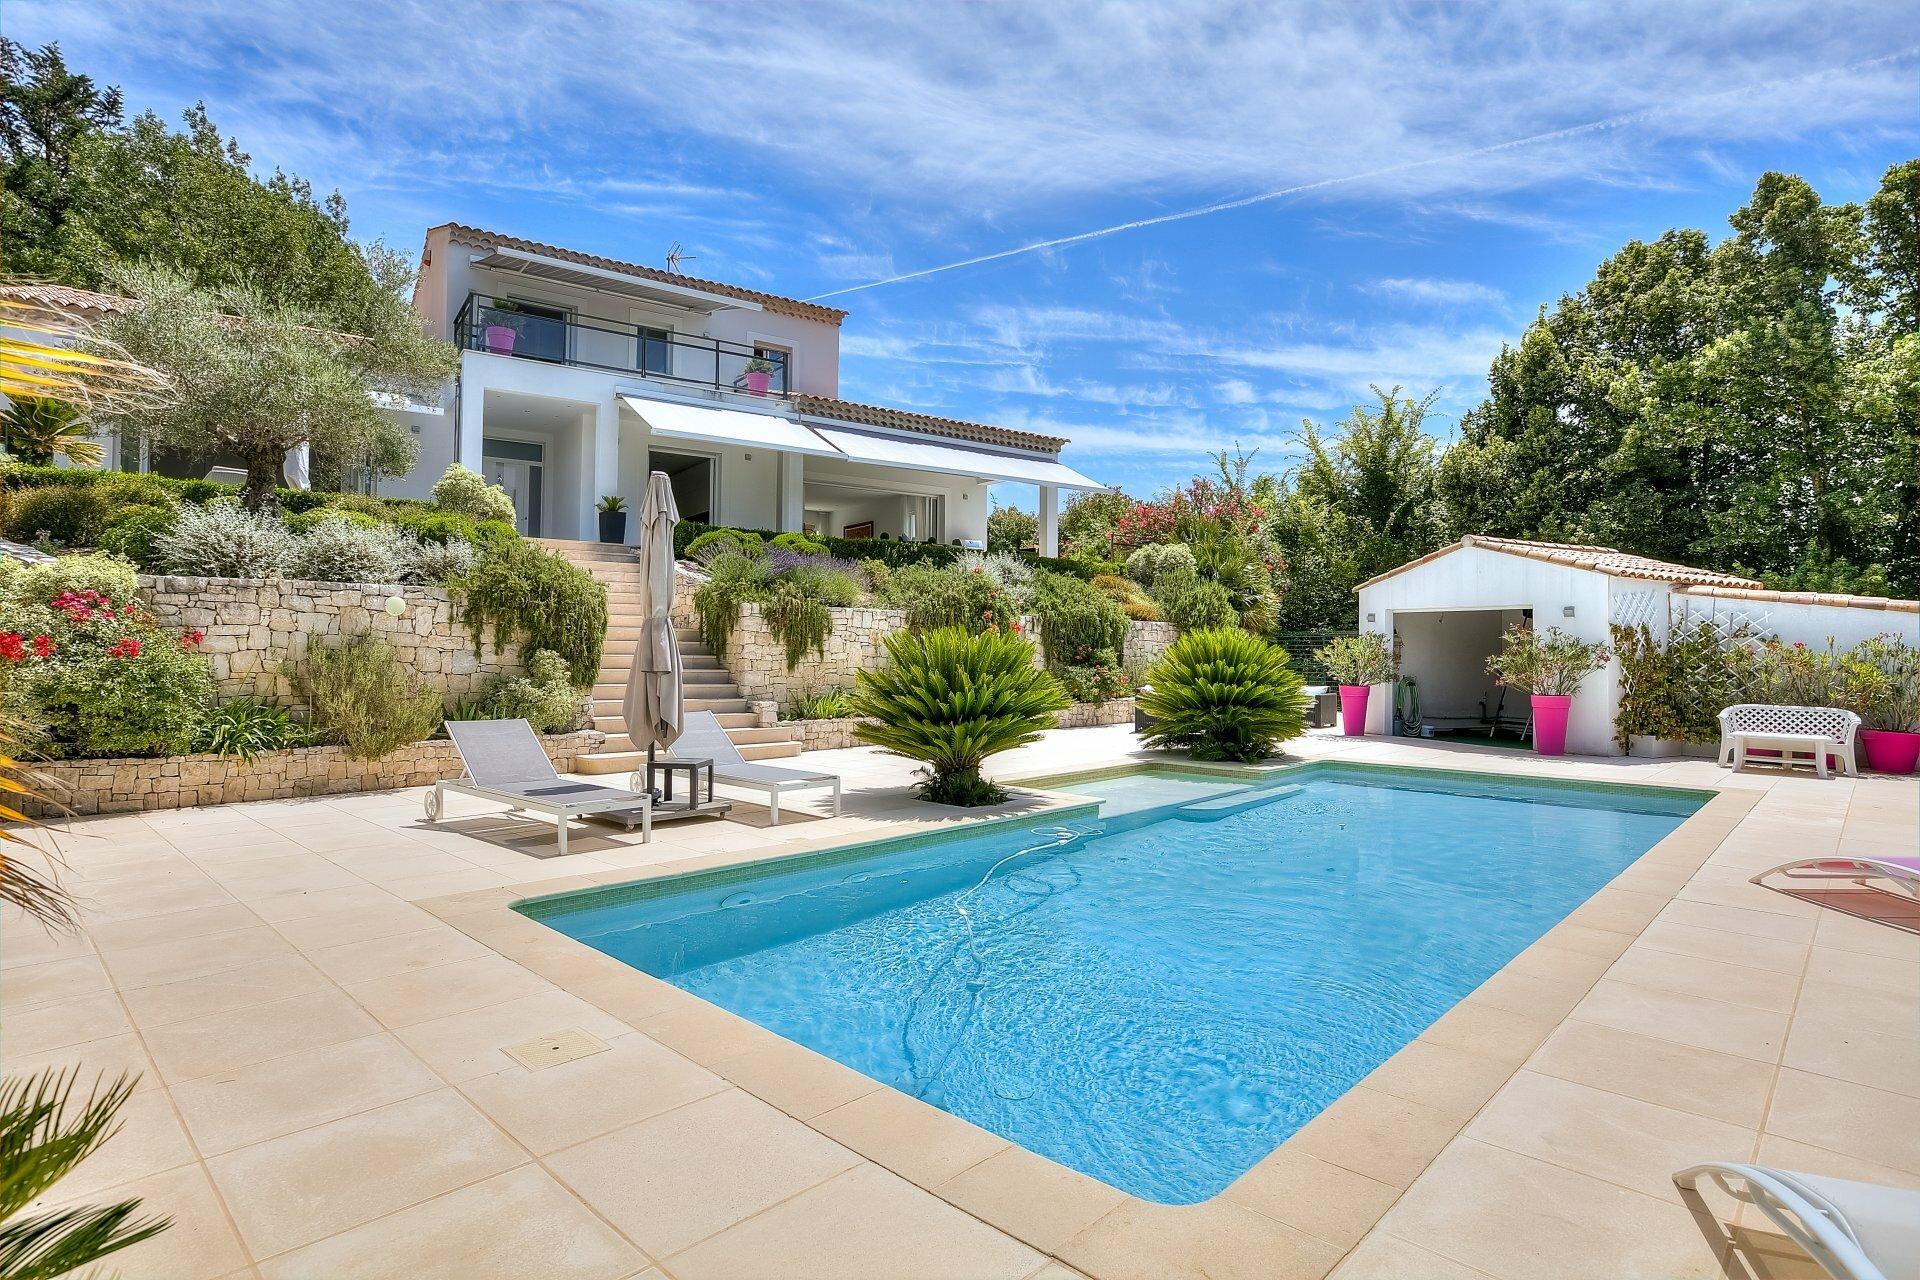 Villa in Opio, Provence-Alpes-Côte d'Azur, France 1 - 11517656